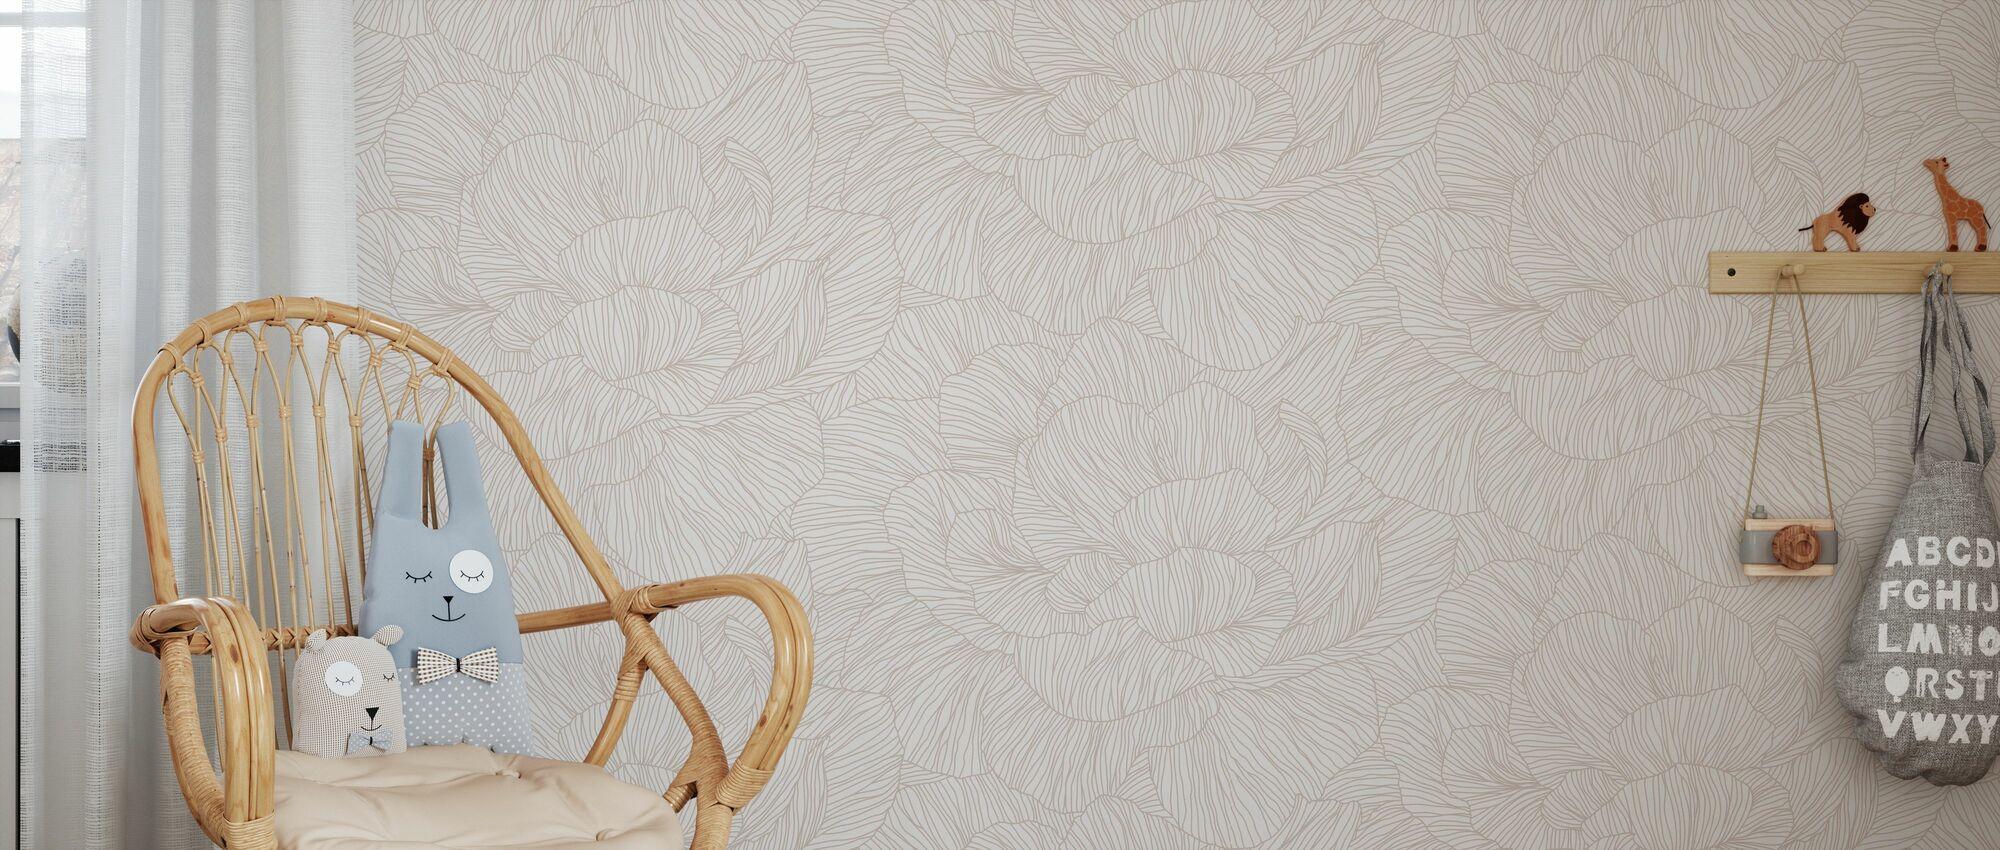 Rose - Winter Garden - Wallpaper - Kids Room